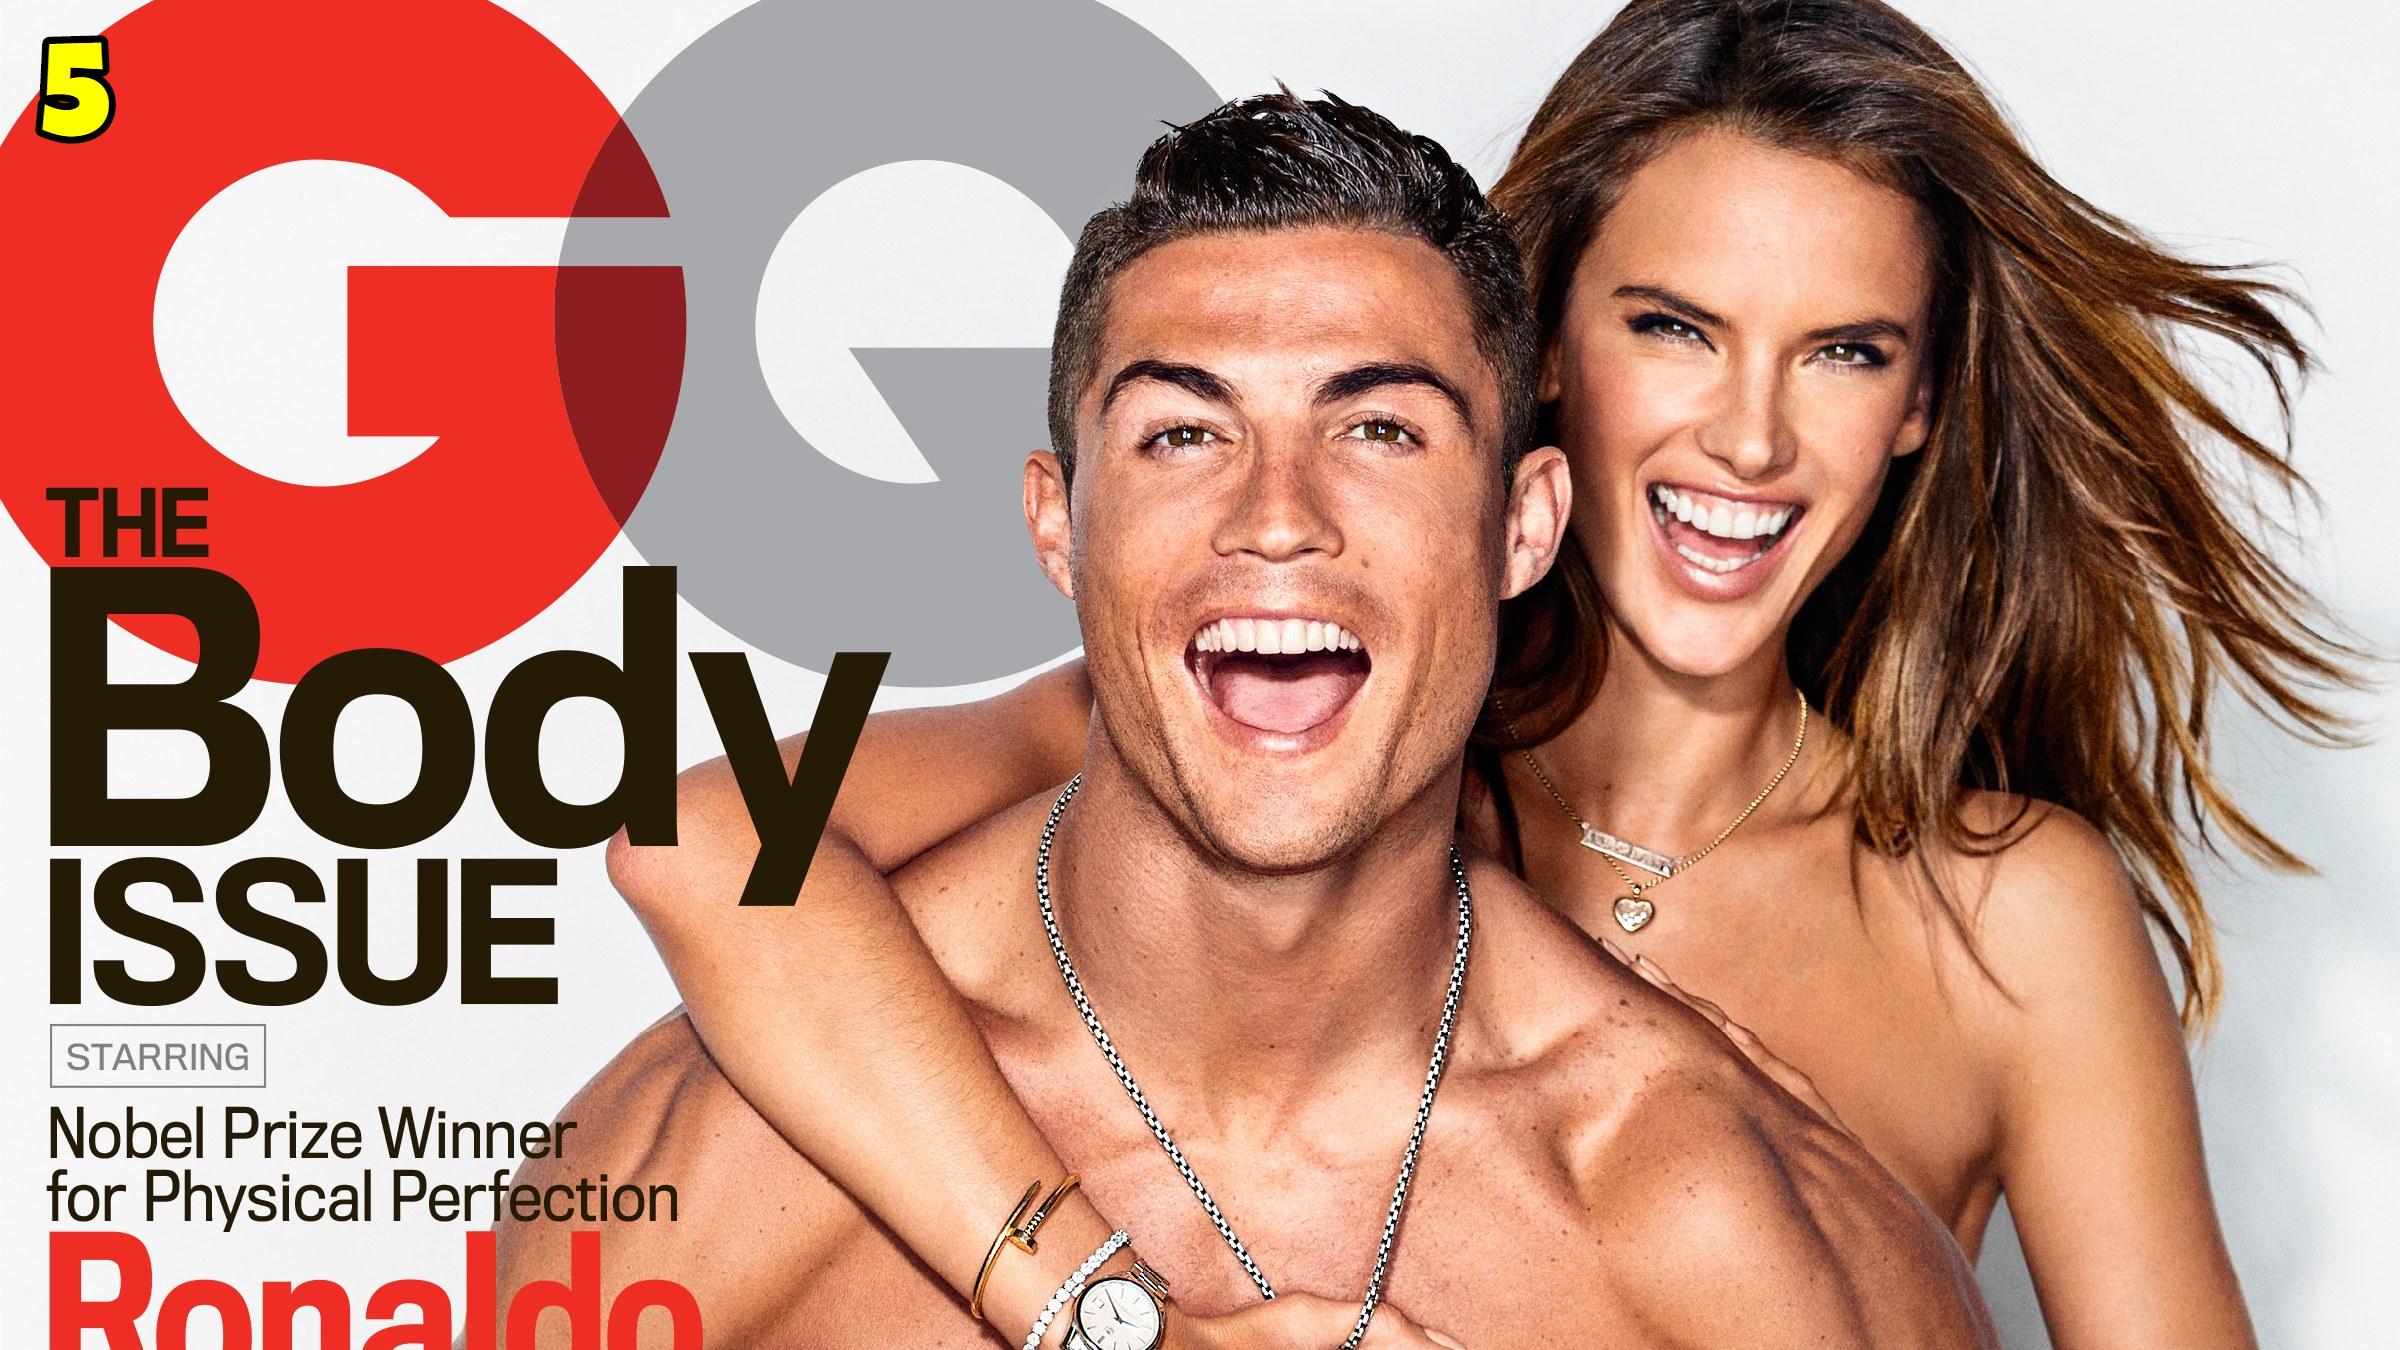 Cristiano Ronaldo And Alessandra Ambrosio Dating